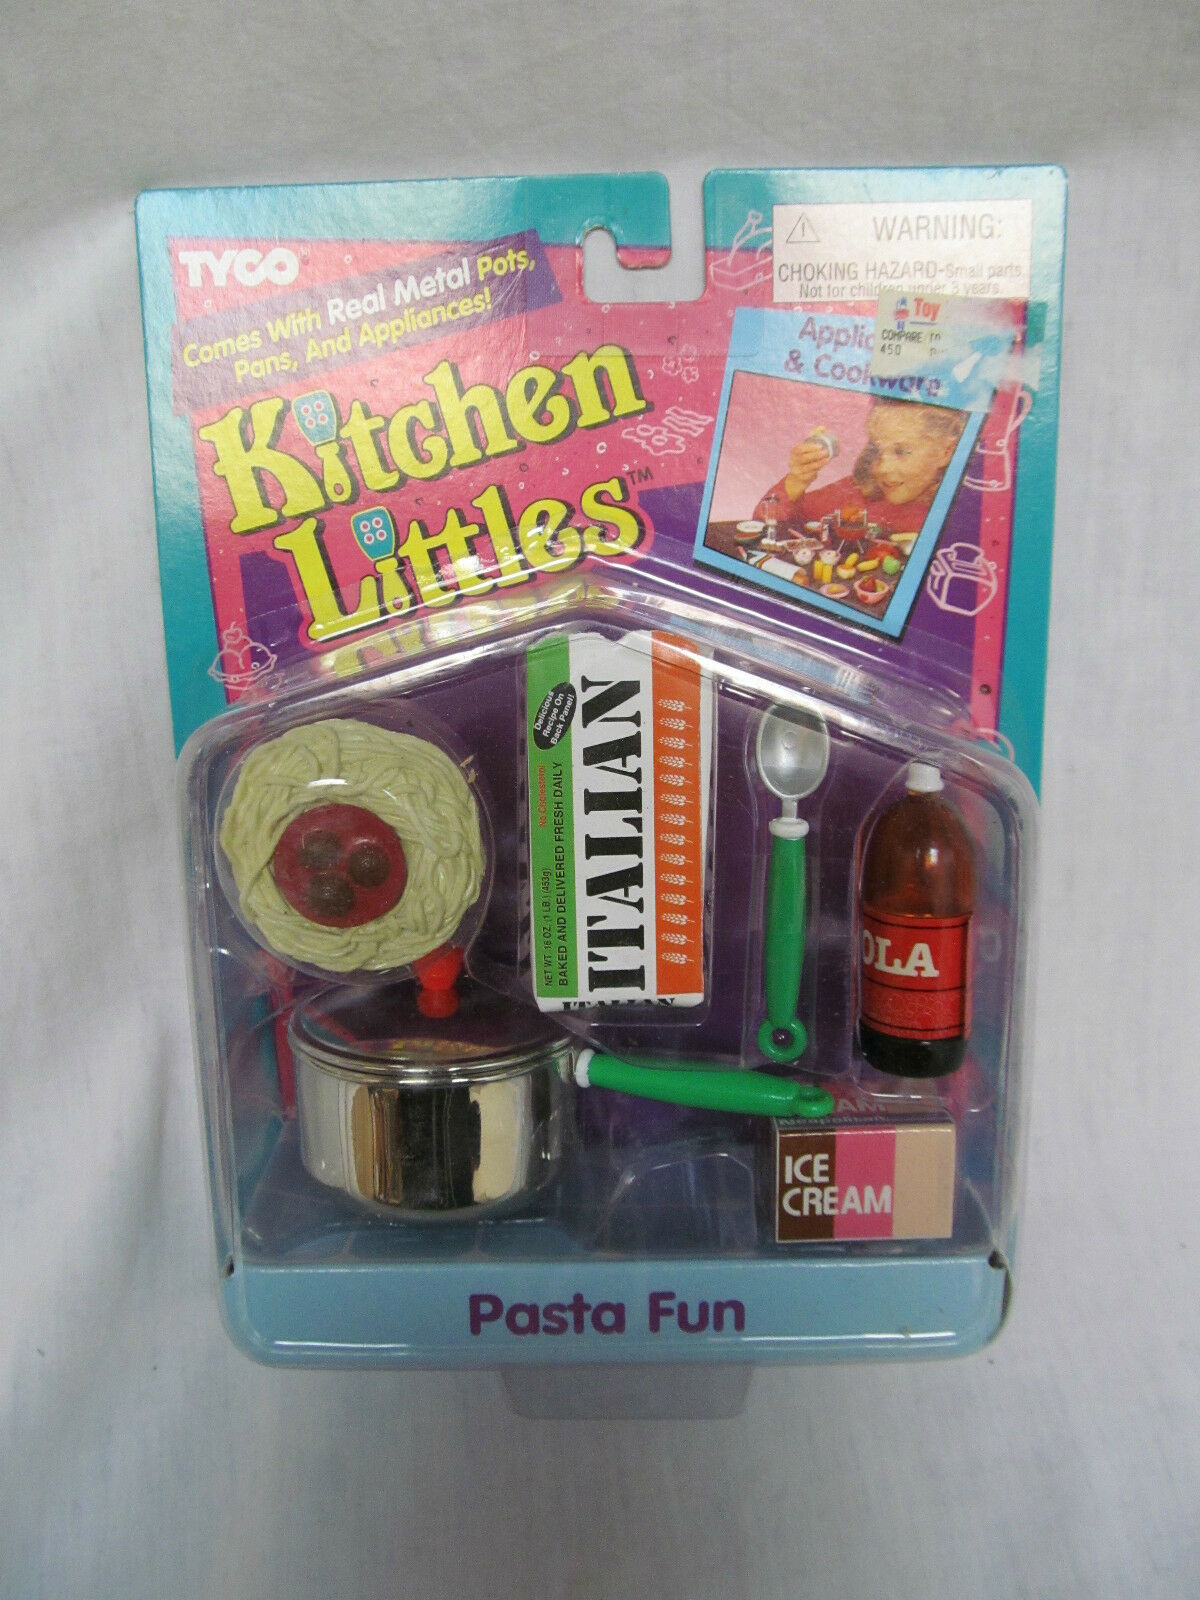 BRAND NEW 1995 BARBIE TYCO KITCHEN LITTLES PASTA FUN APPLIANCES & COOKWARE